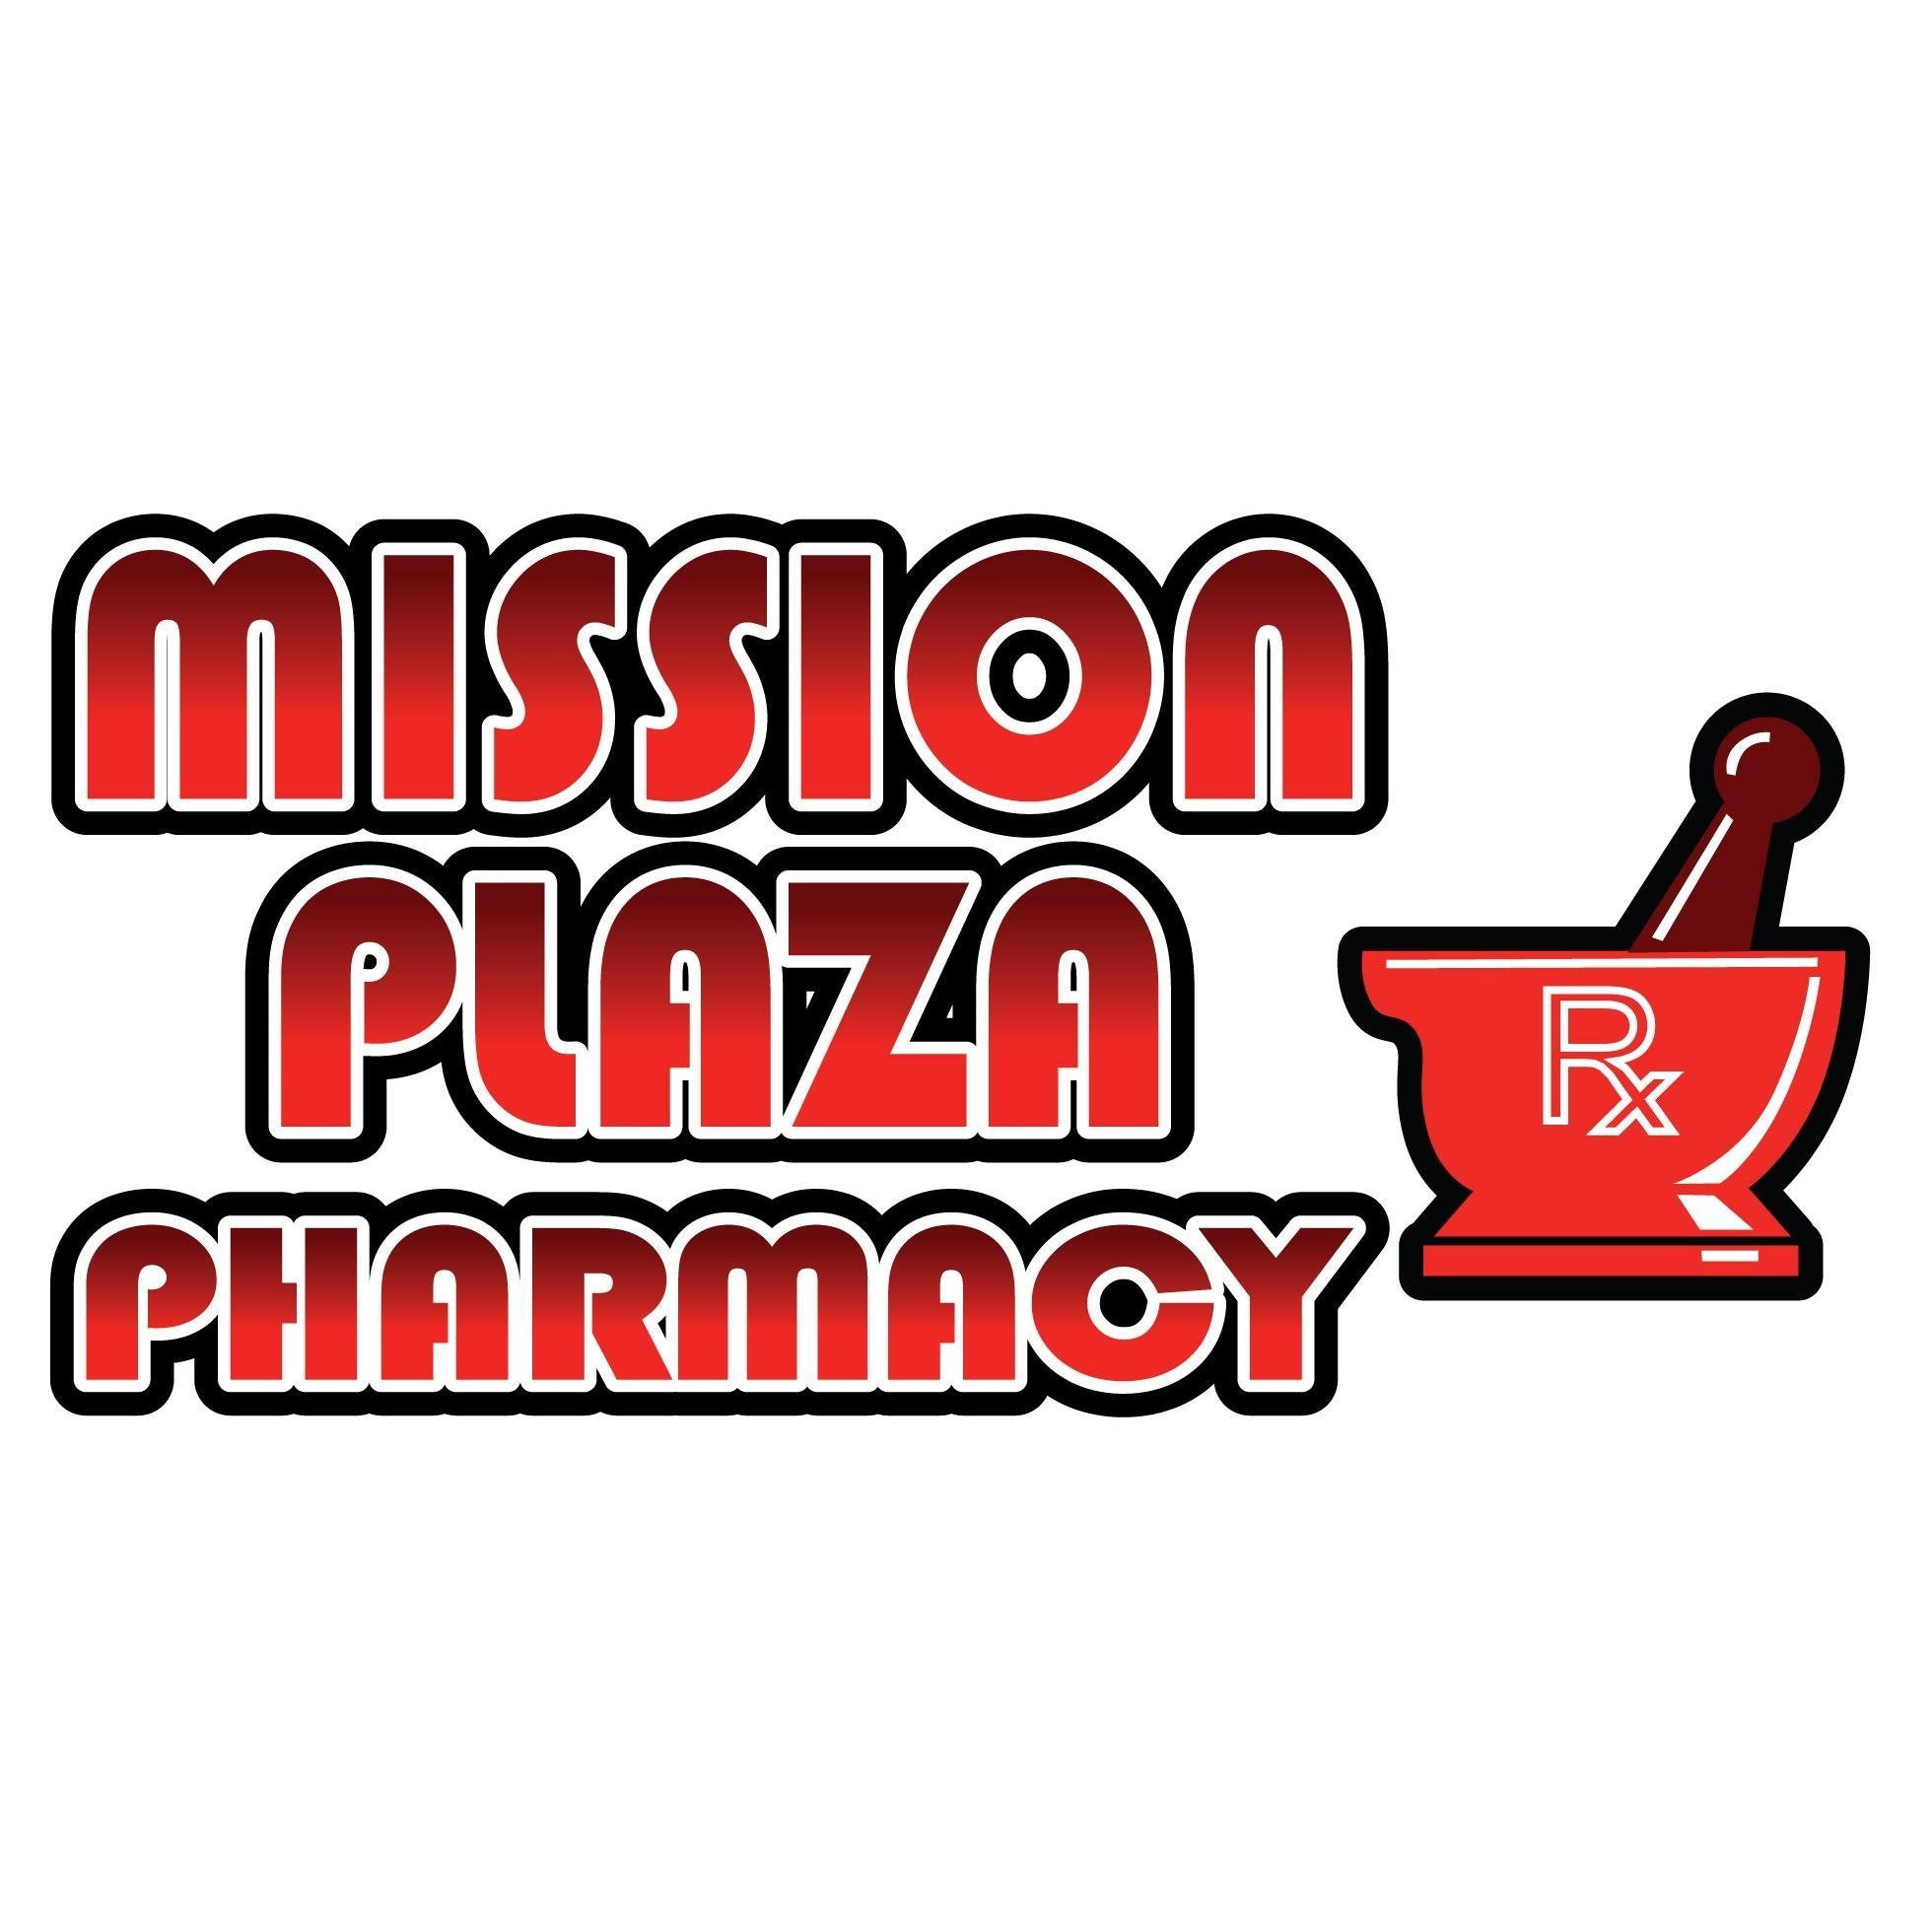 Mission Plaza Pharmacy